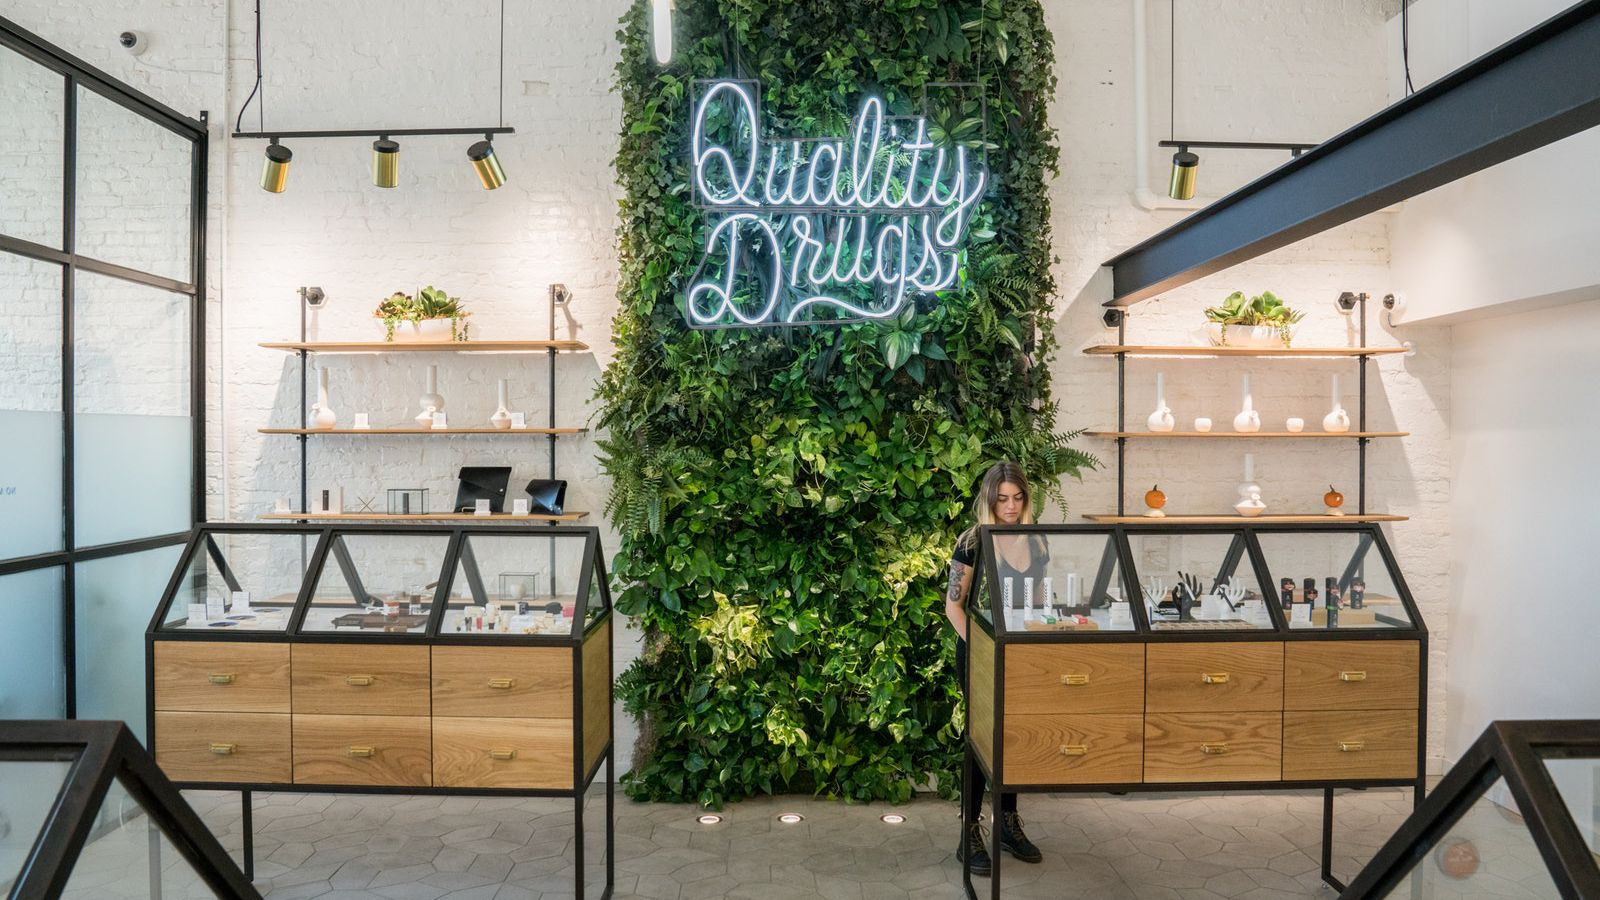 Marijuana dispensary goes minimalist in Portland - Curbed